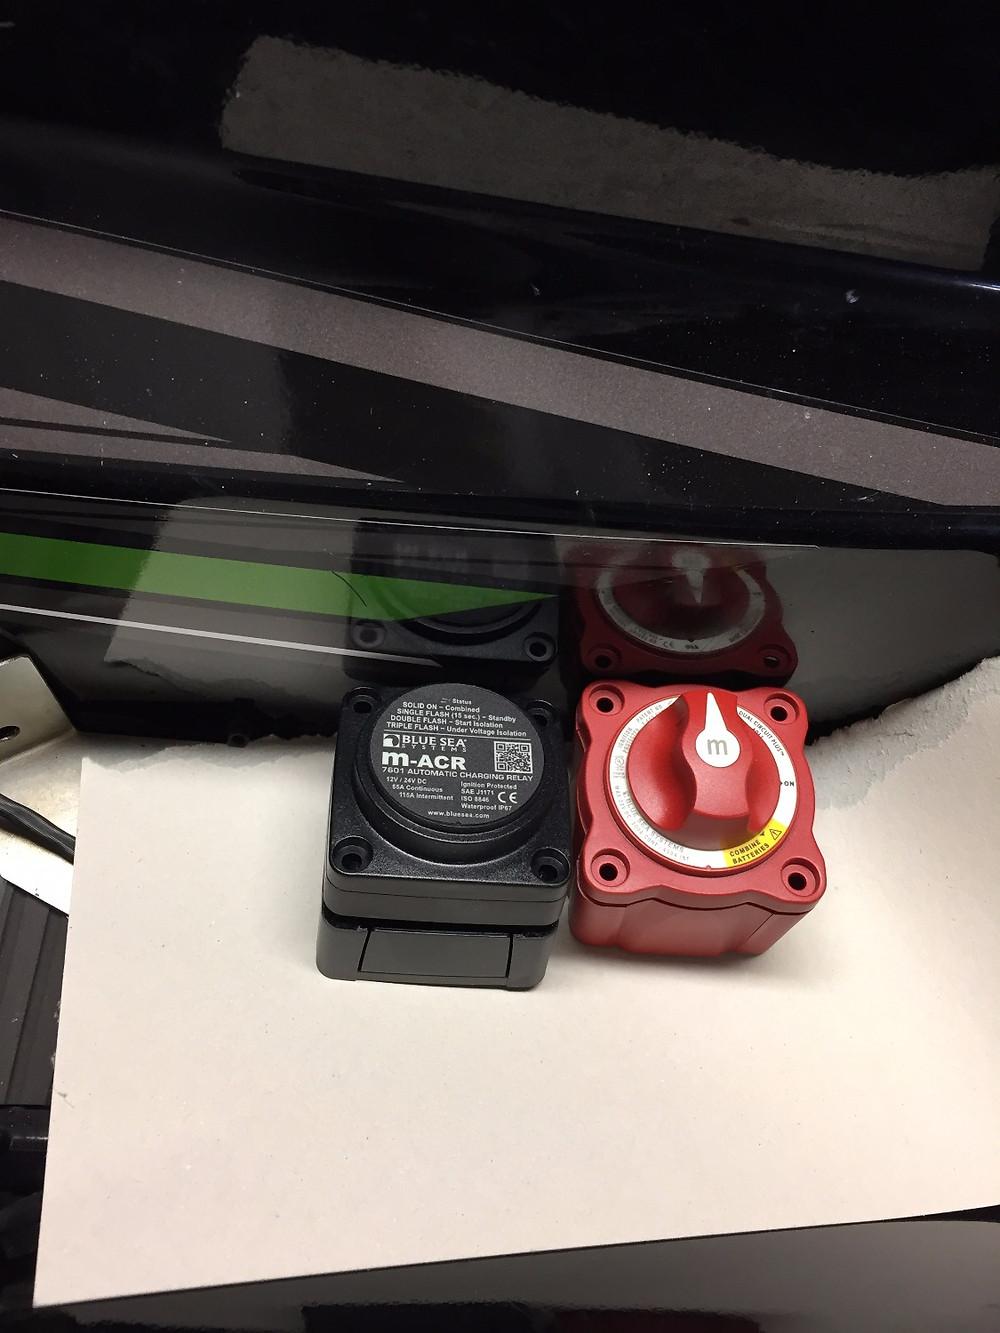 add-a-battery kit